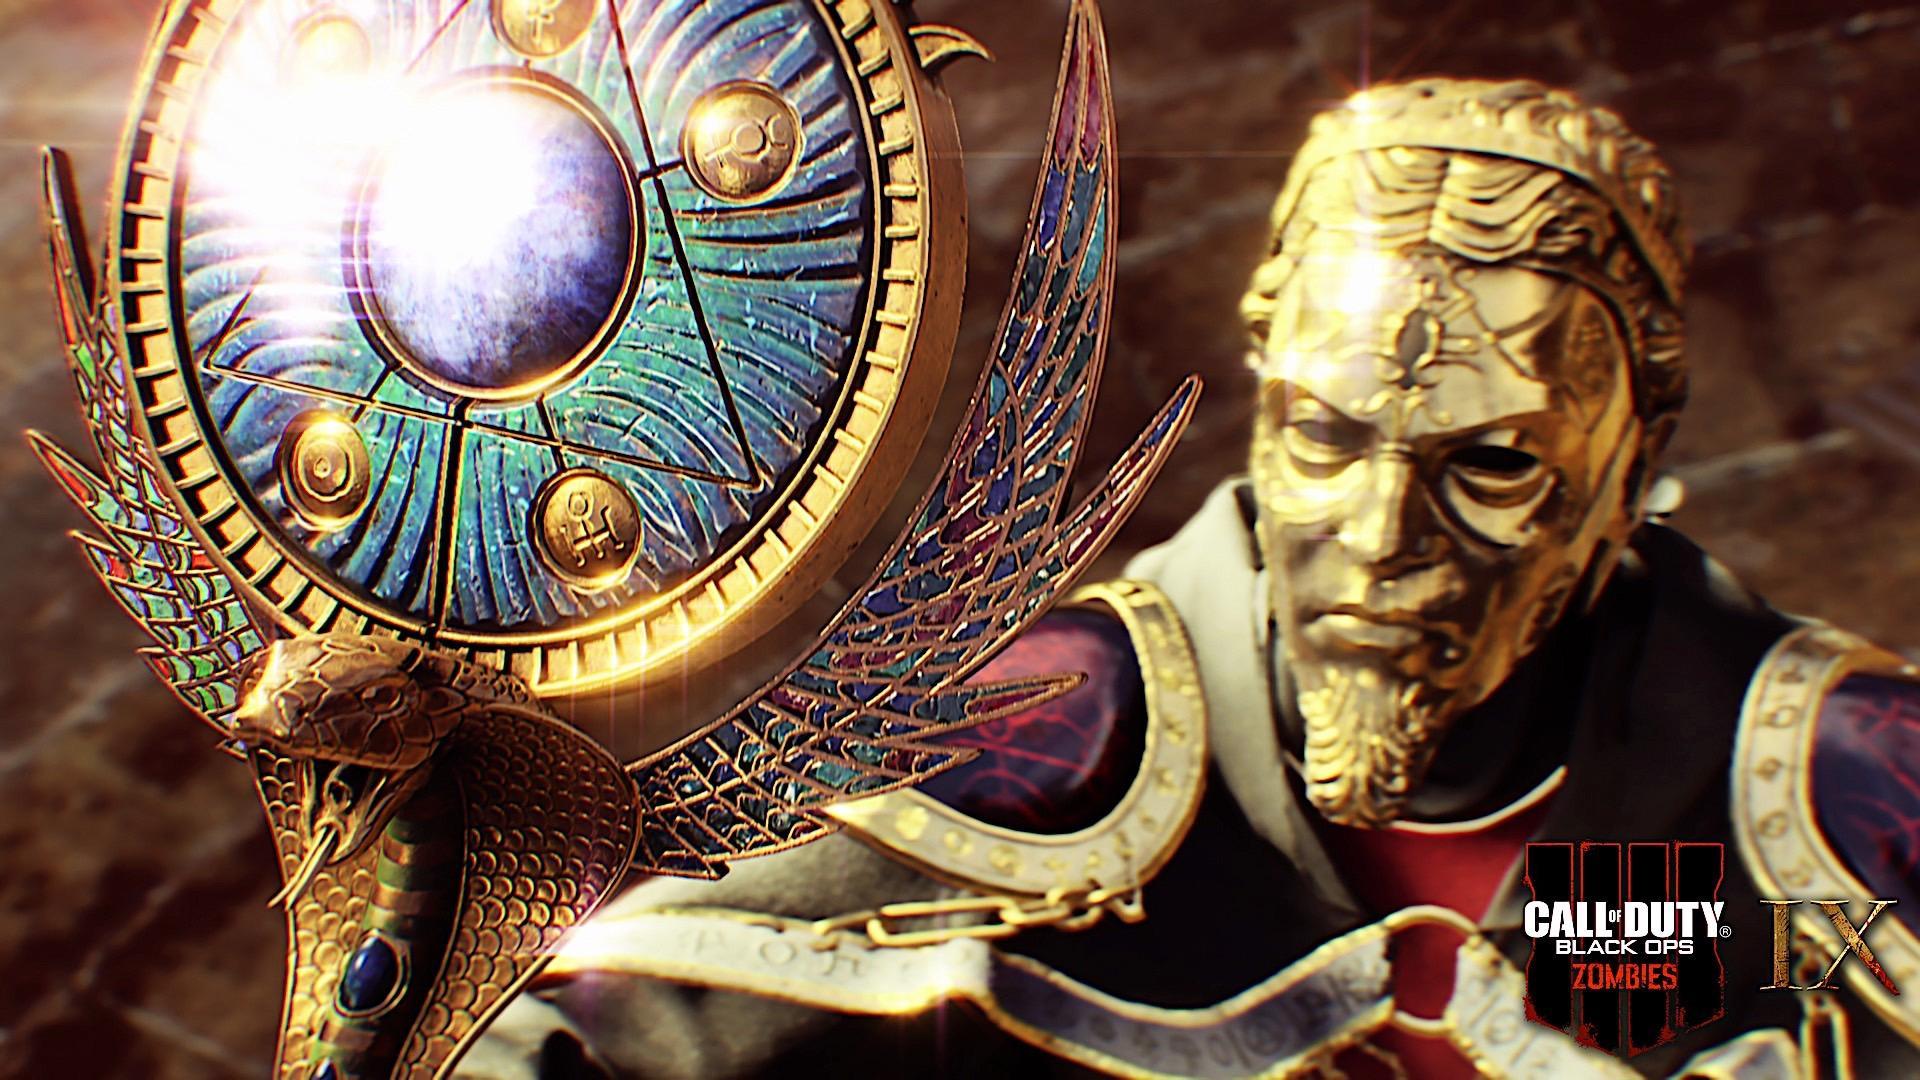 Le prime immagini di Call of Duty: Black Ops IIII